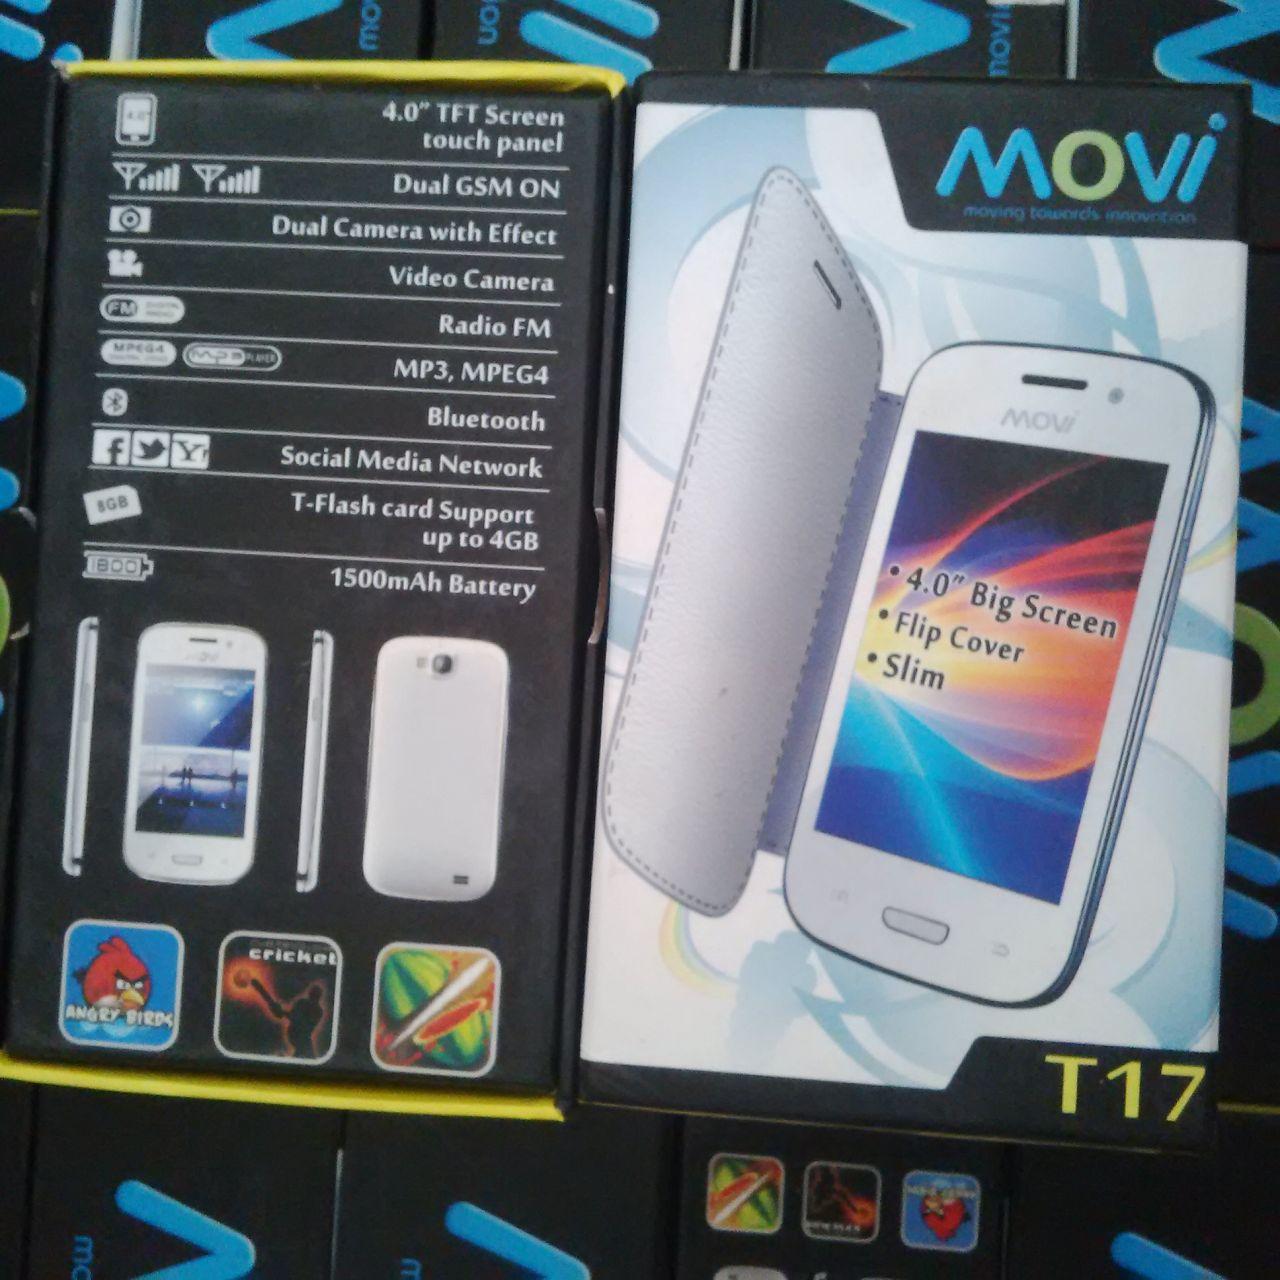 Hp touchscreen 4 inch dual gsm termurah movi T17